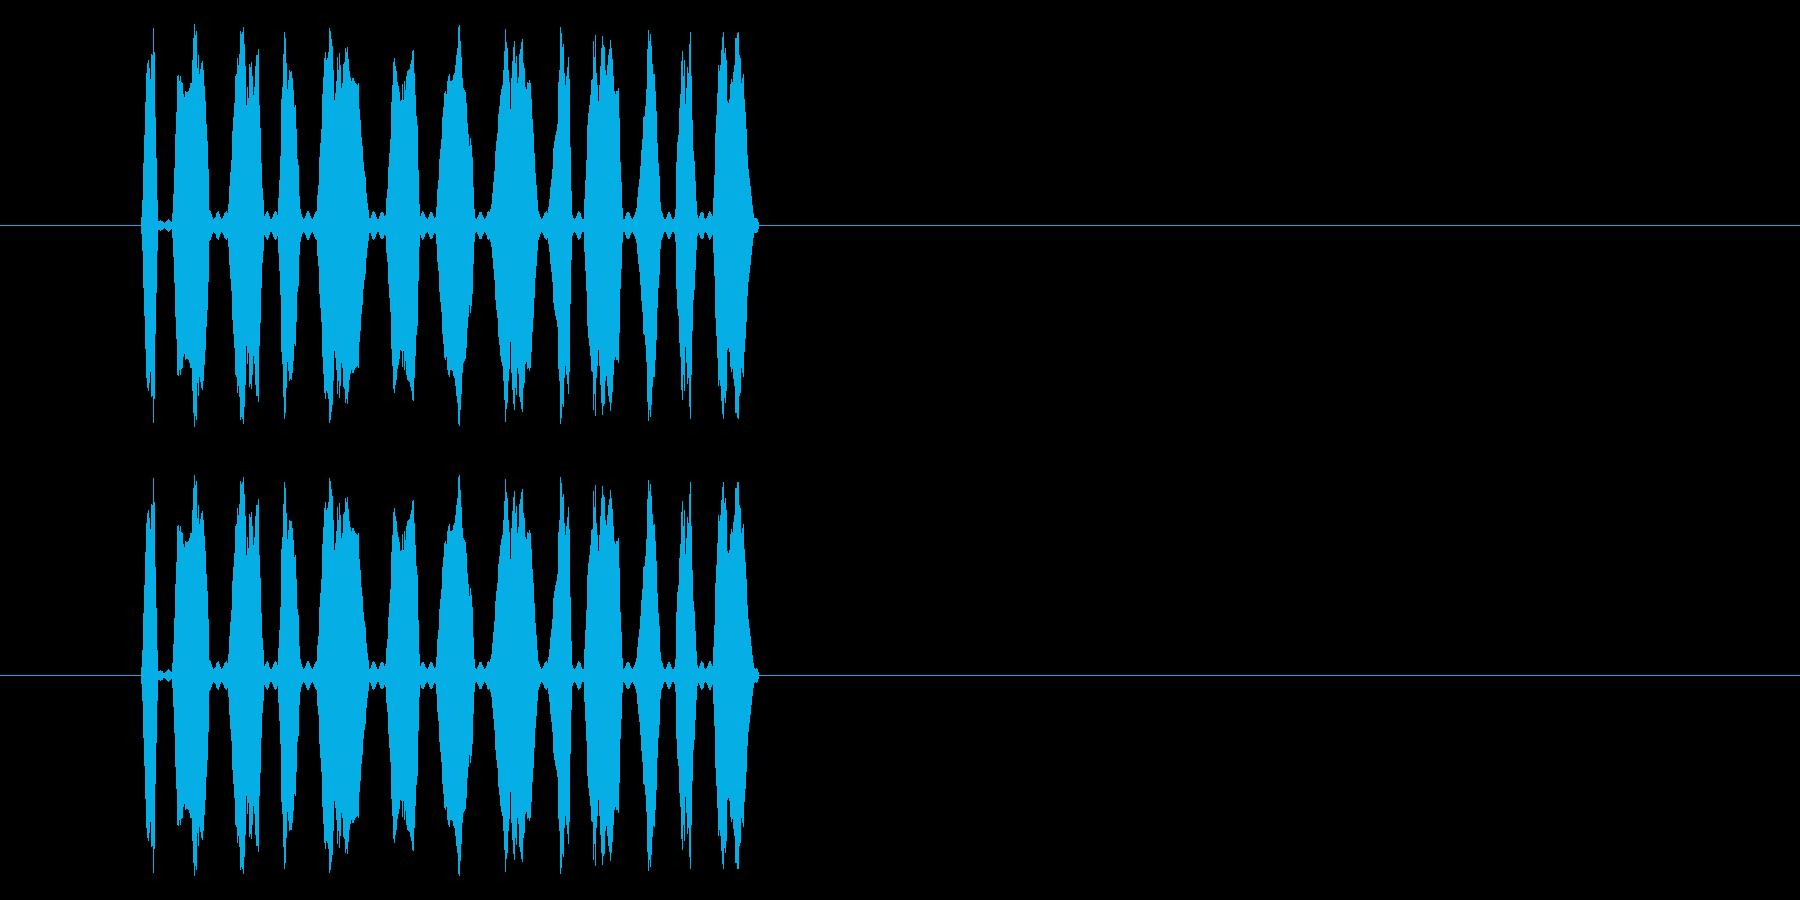 【NES RPG01-09(メッセージ)の再生済みの波形